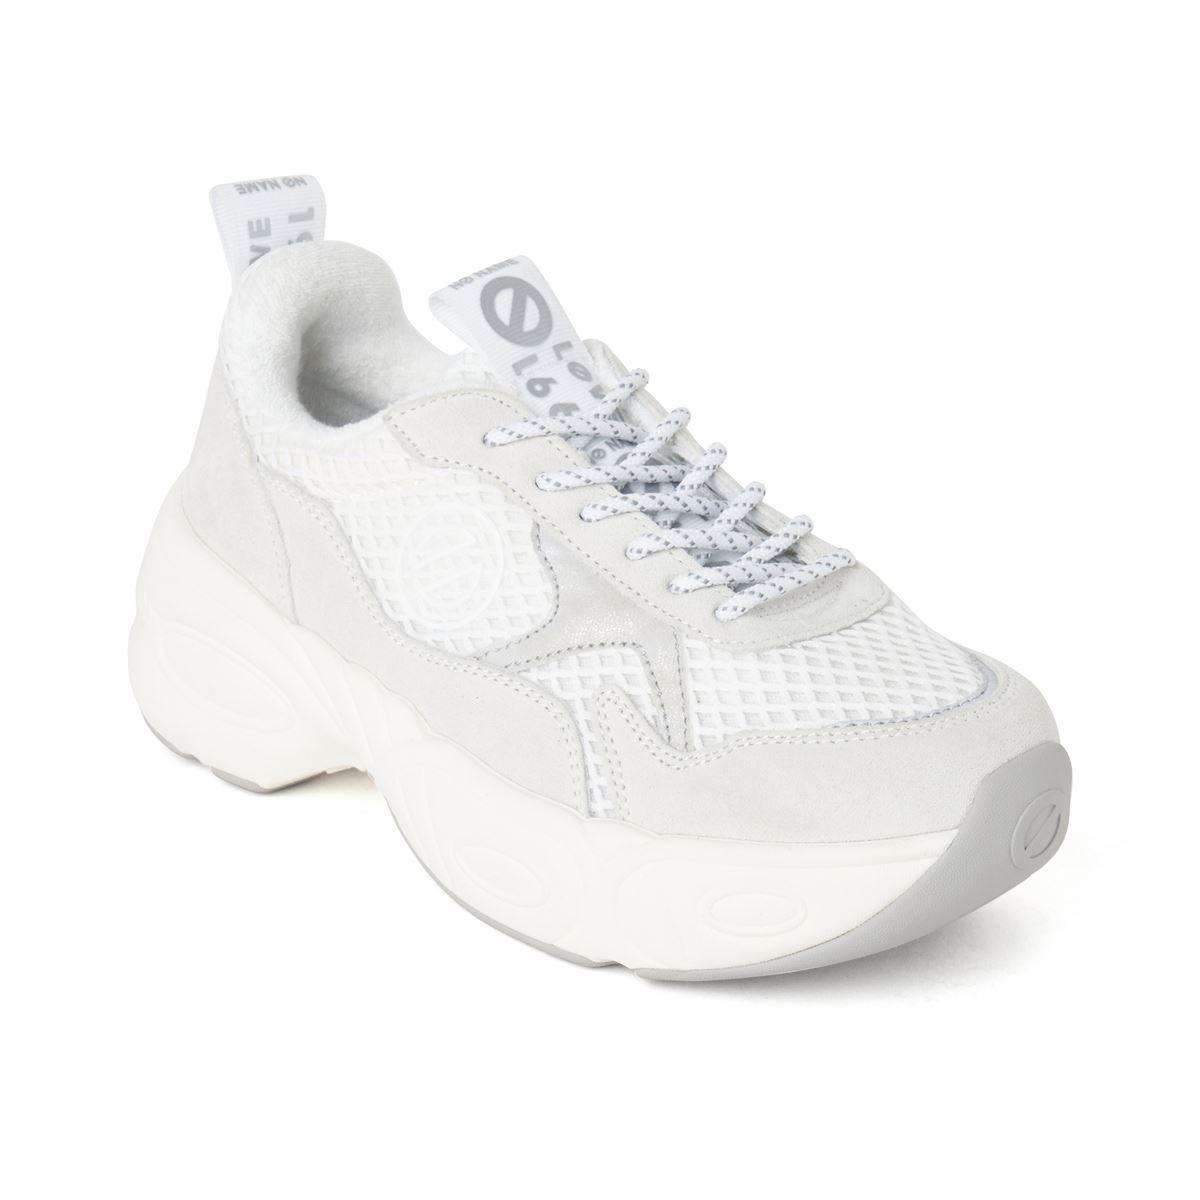 NITRO-01187-WHITE ニトロ ホワイト